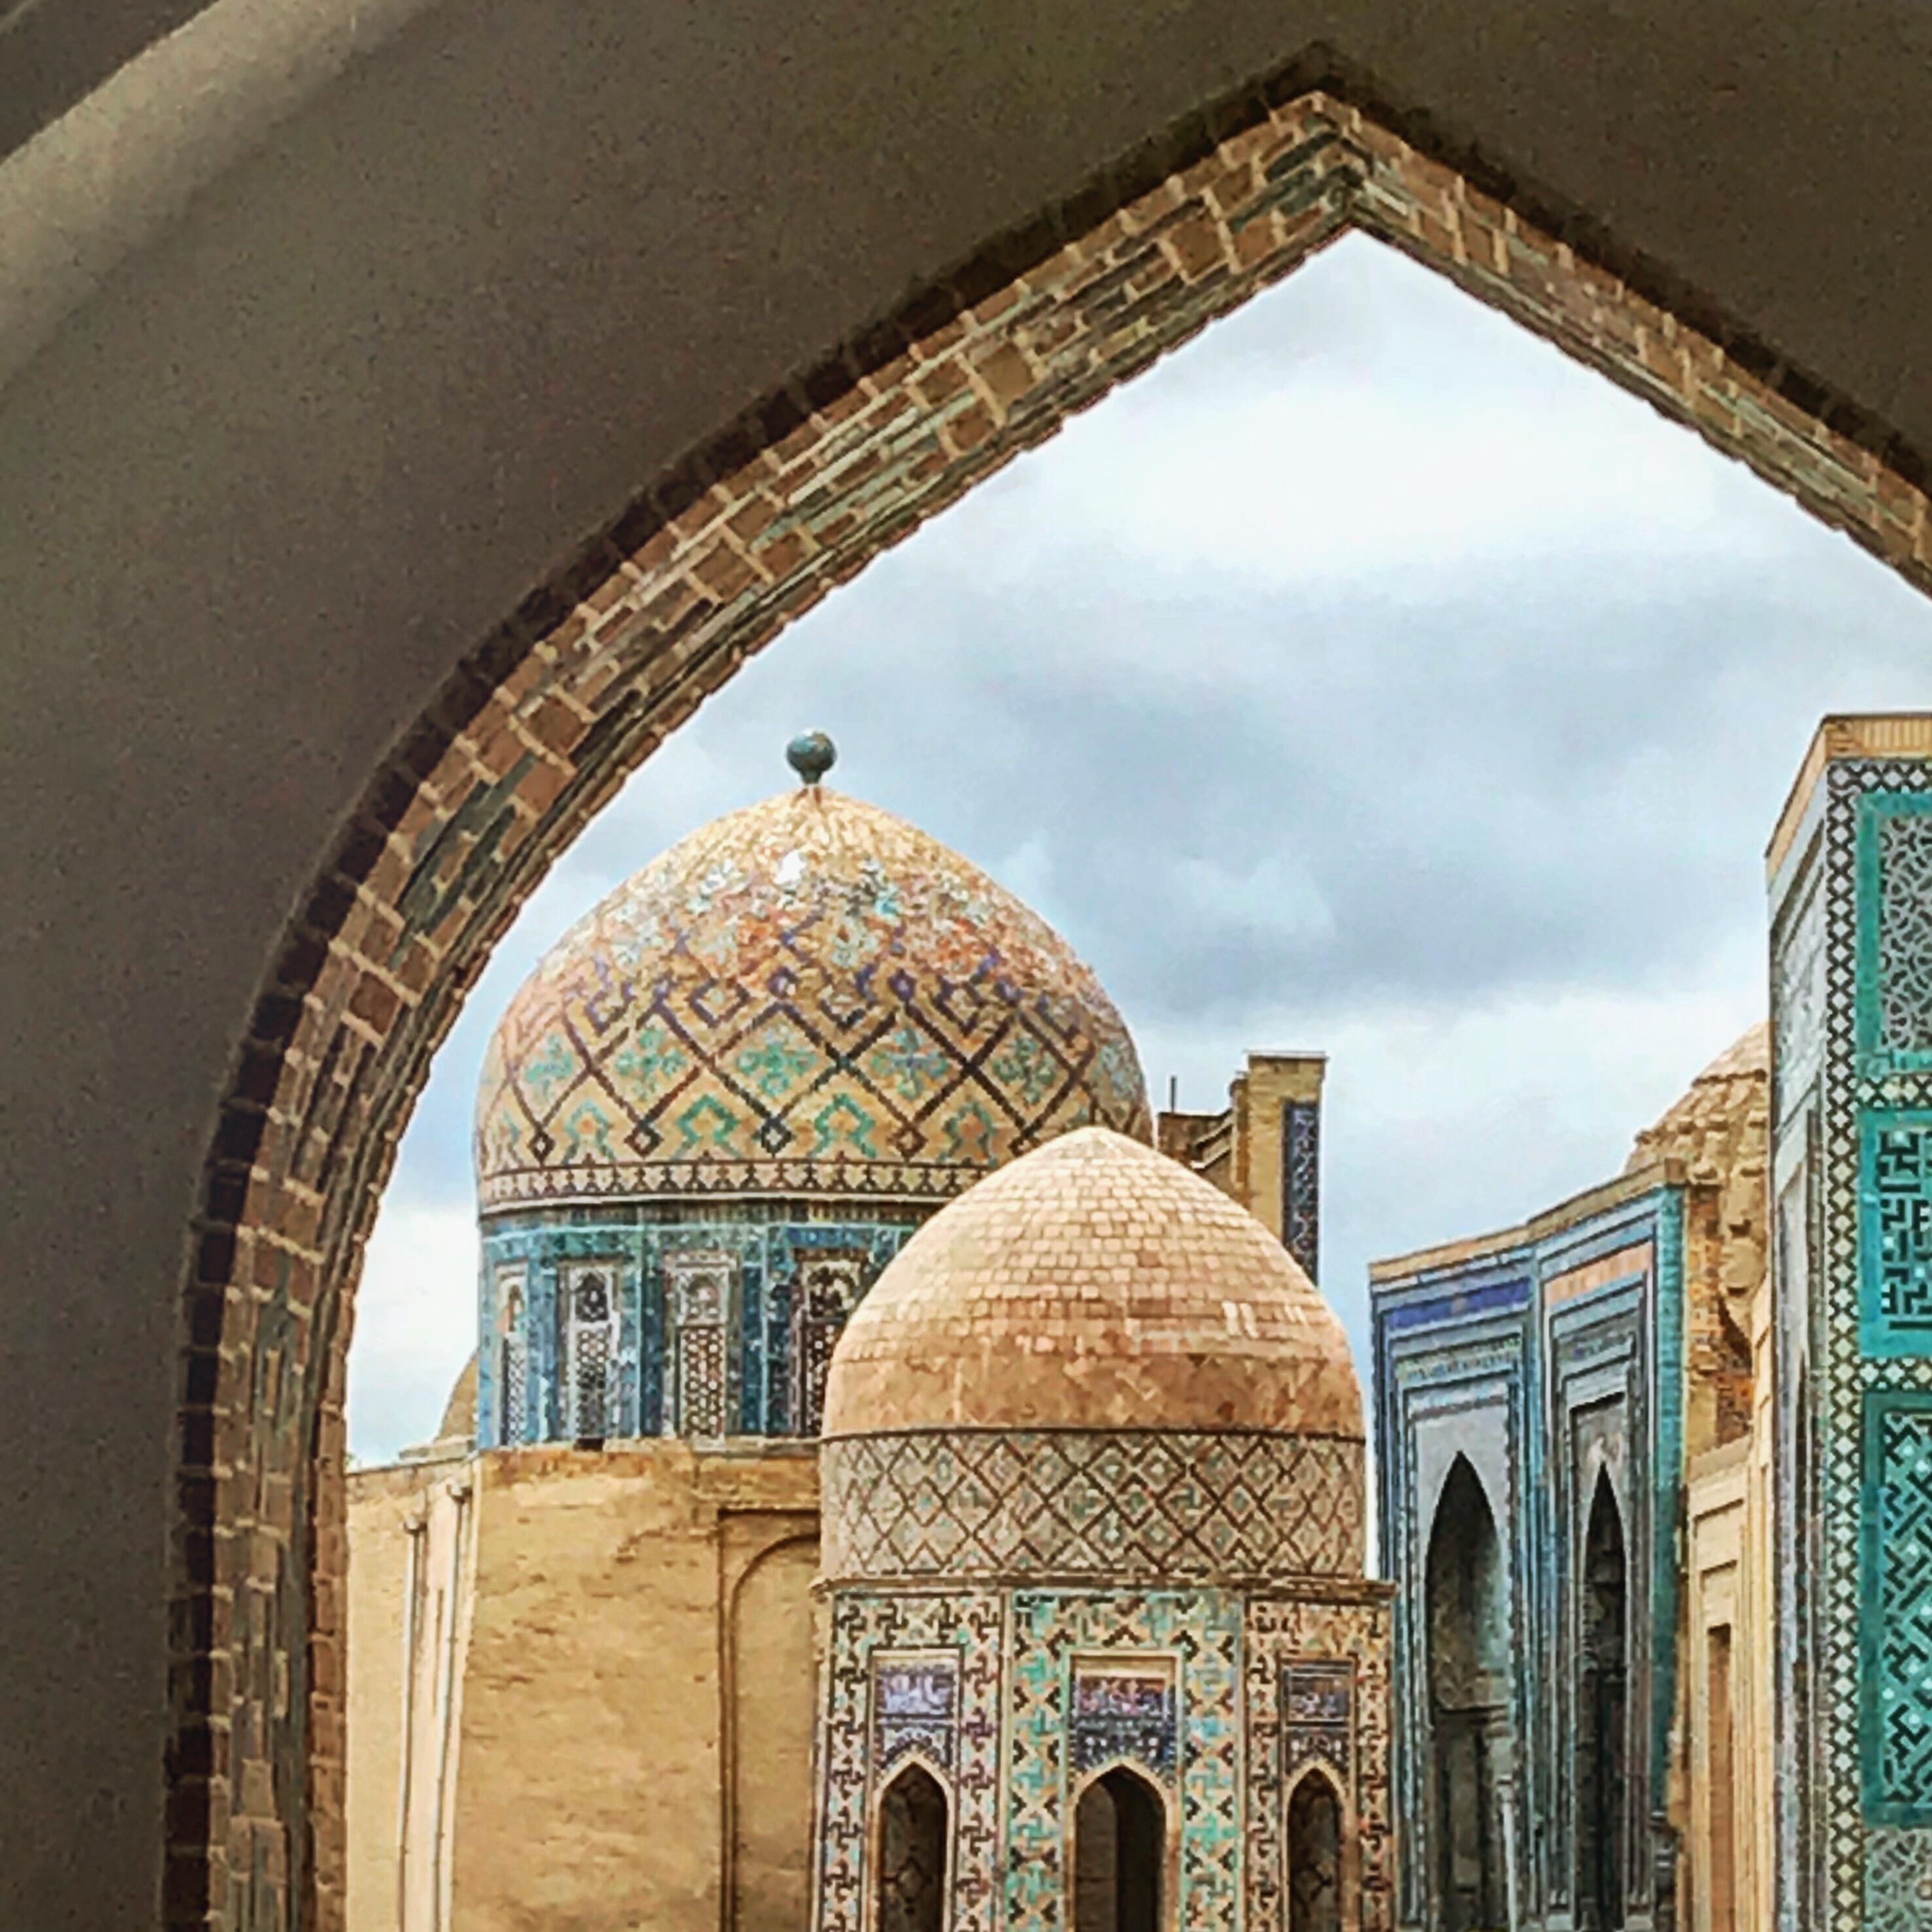 Usbekistand kscheib Shohizinda Samarkand